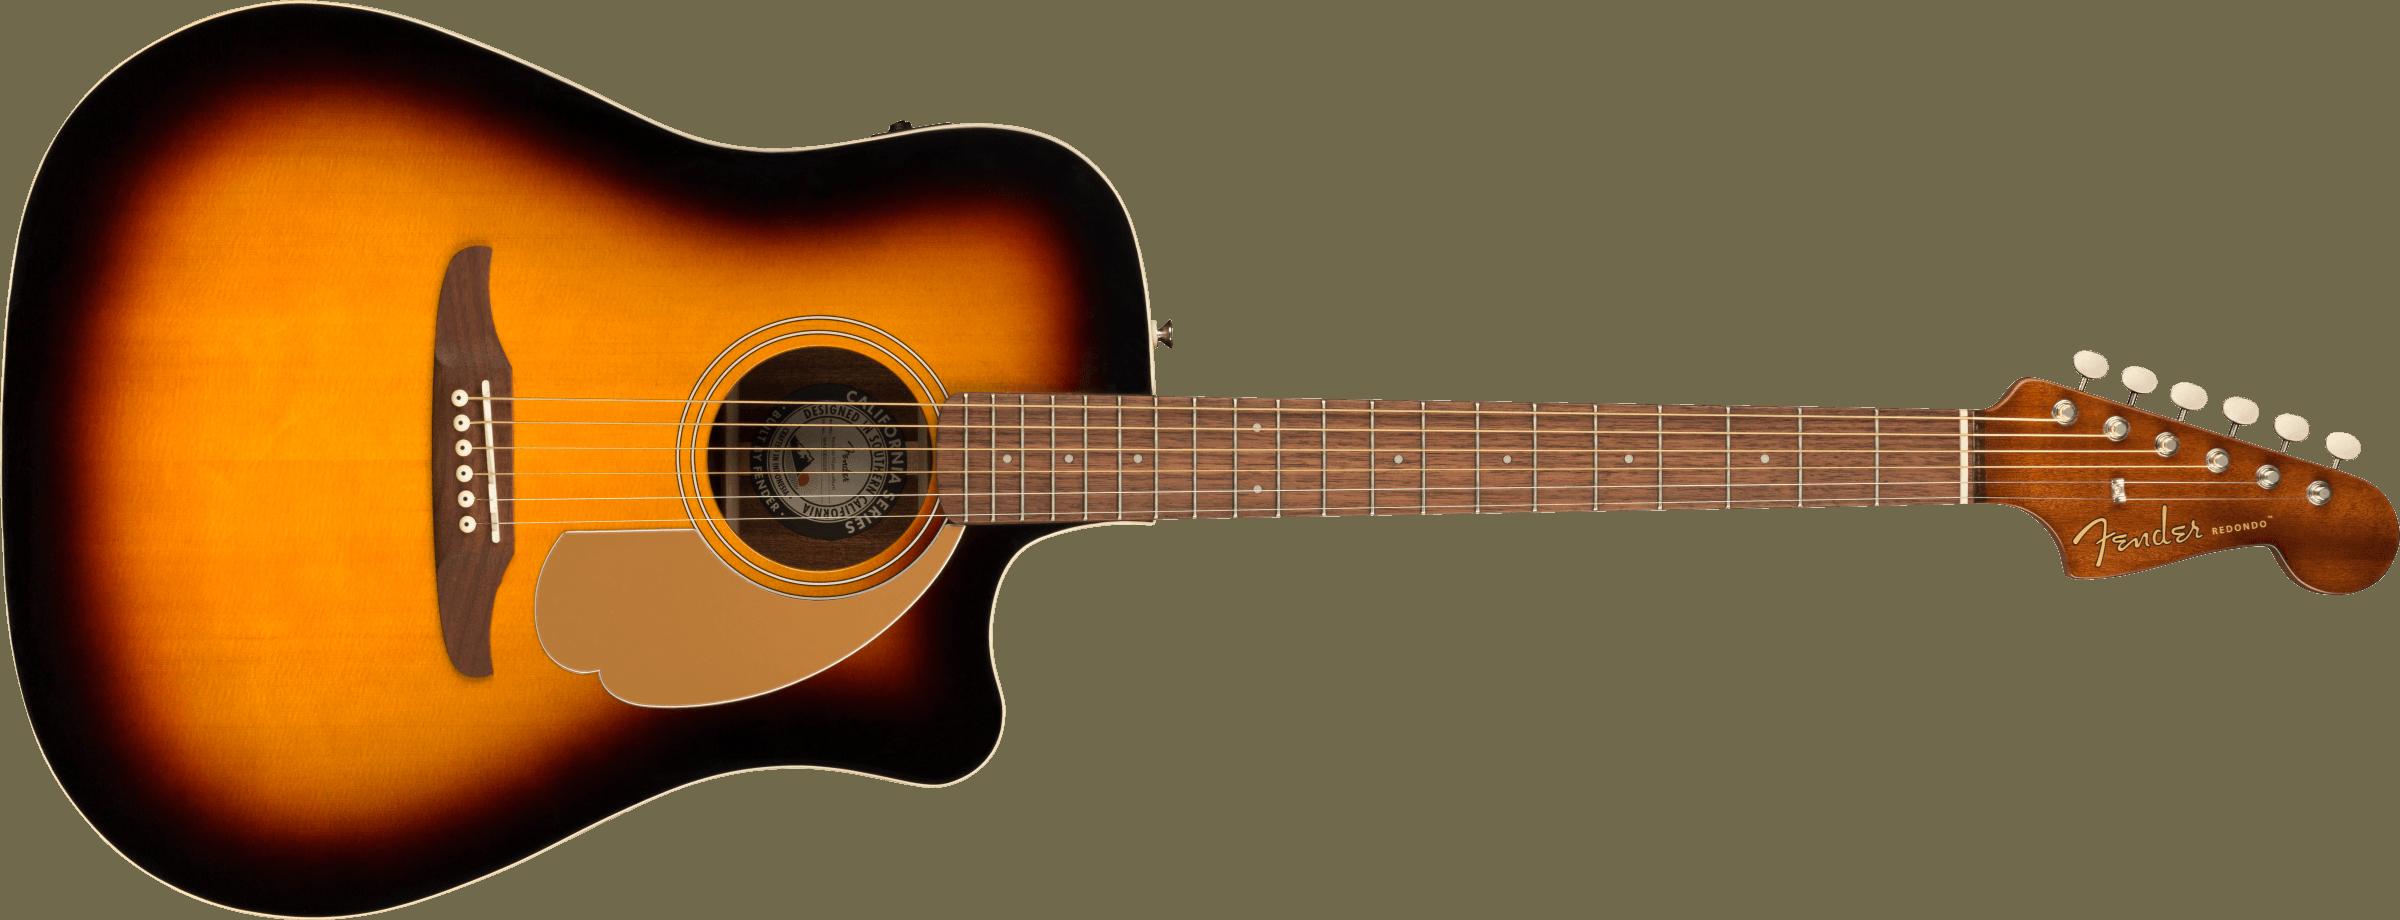 Fender Redondo Player Walnut Fingerboard Sunburst